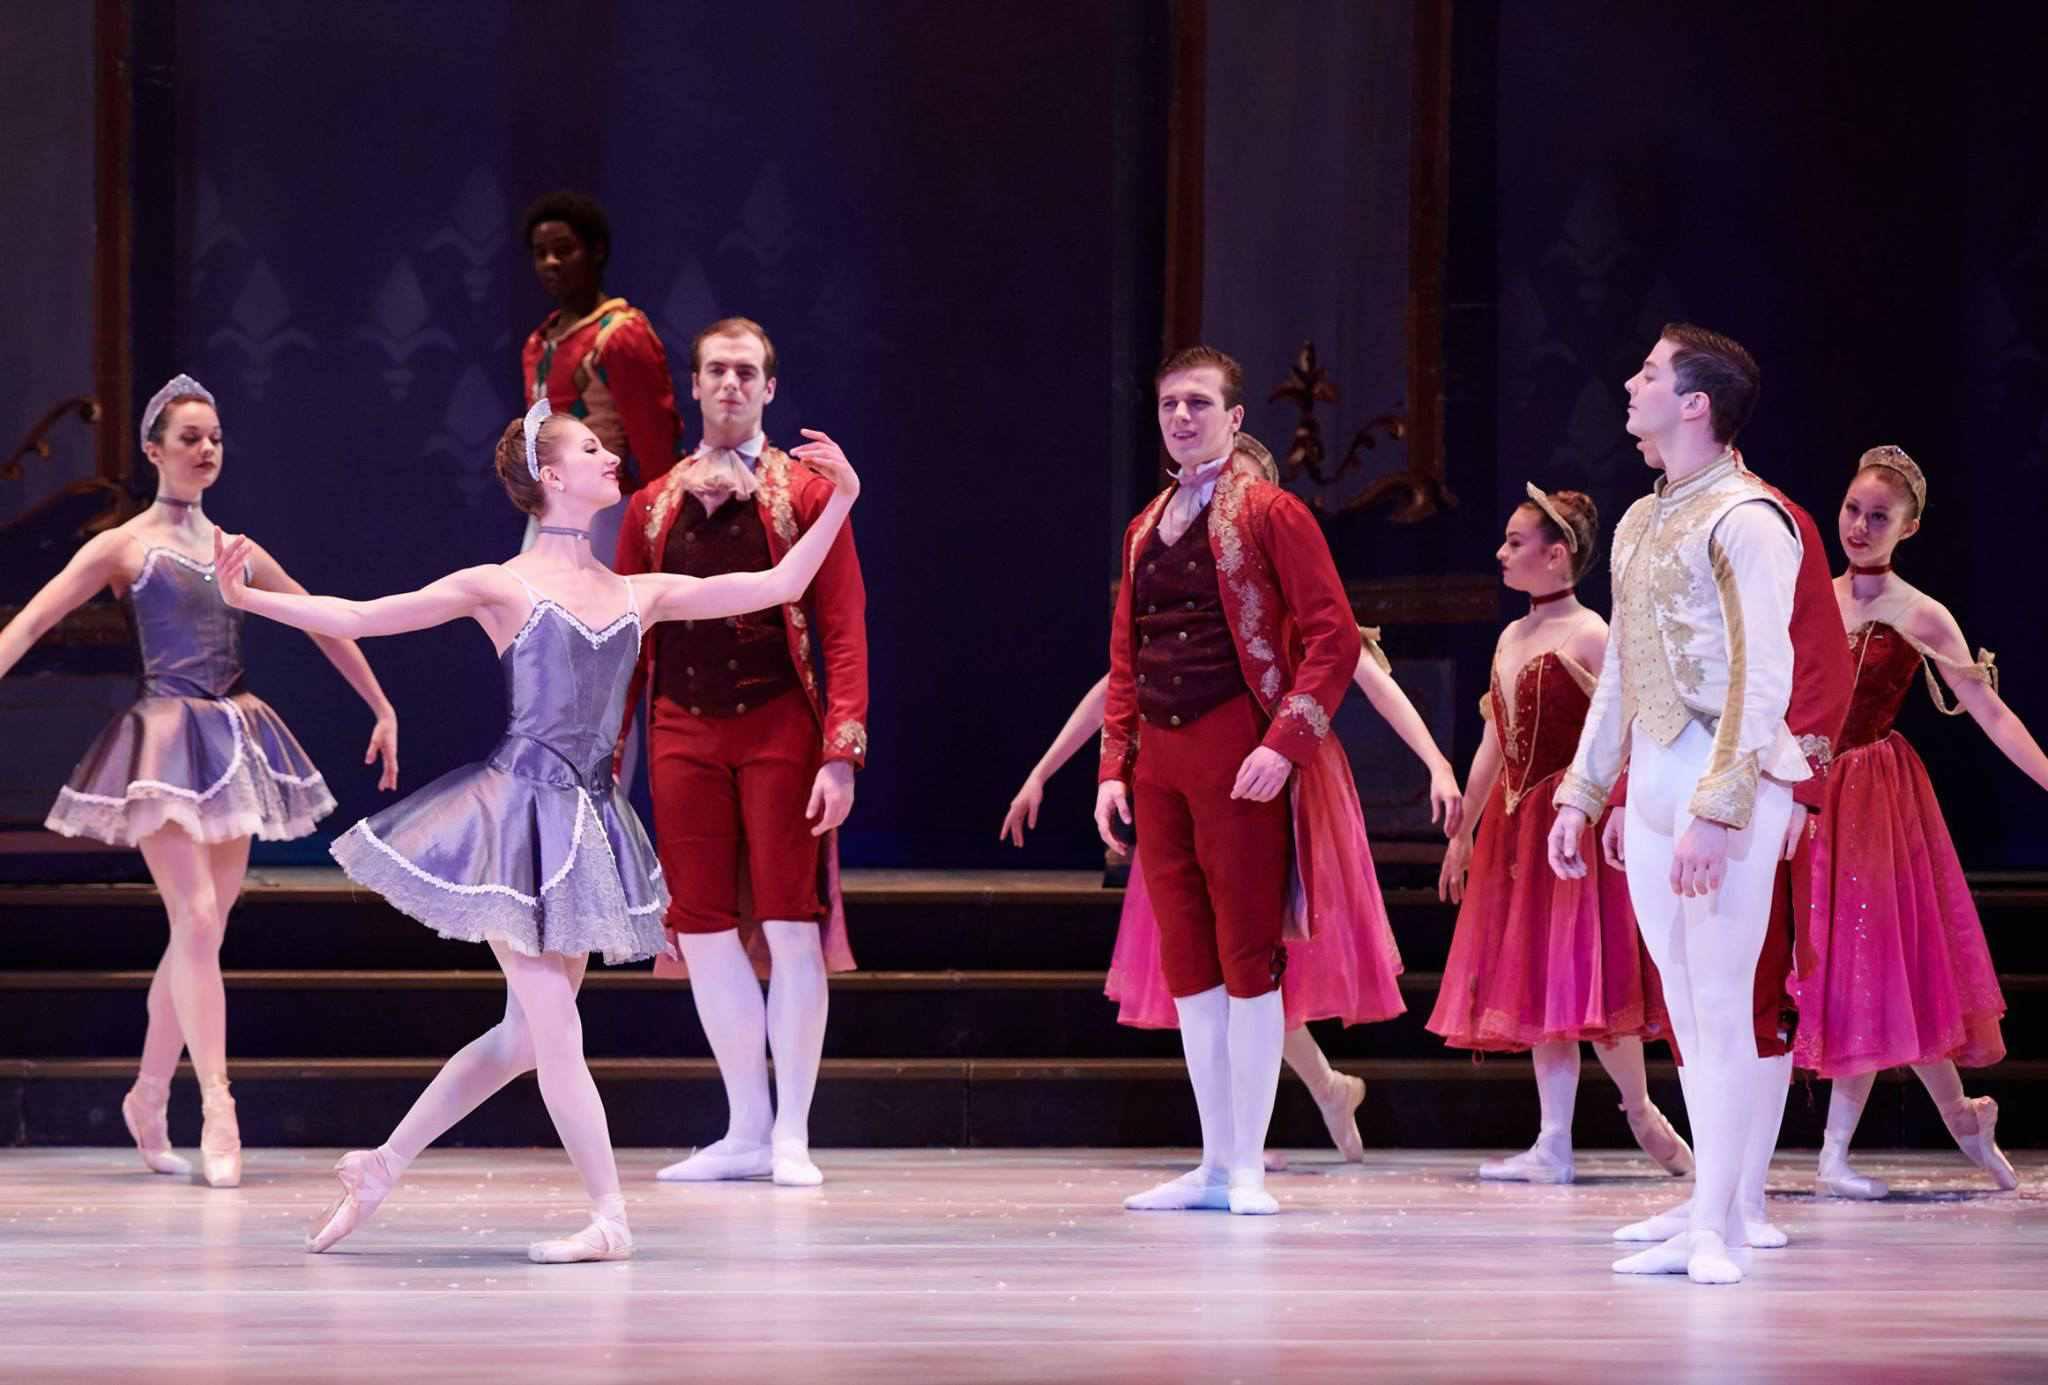 St. Louis Ballet performing The Nutcracker